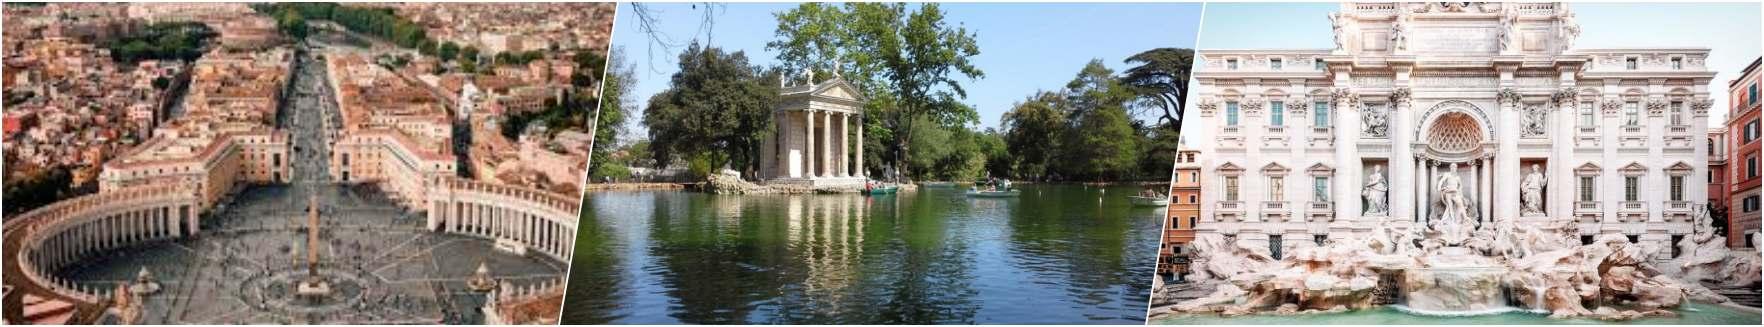 Rome - Tiverina - Trevi Fountain